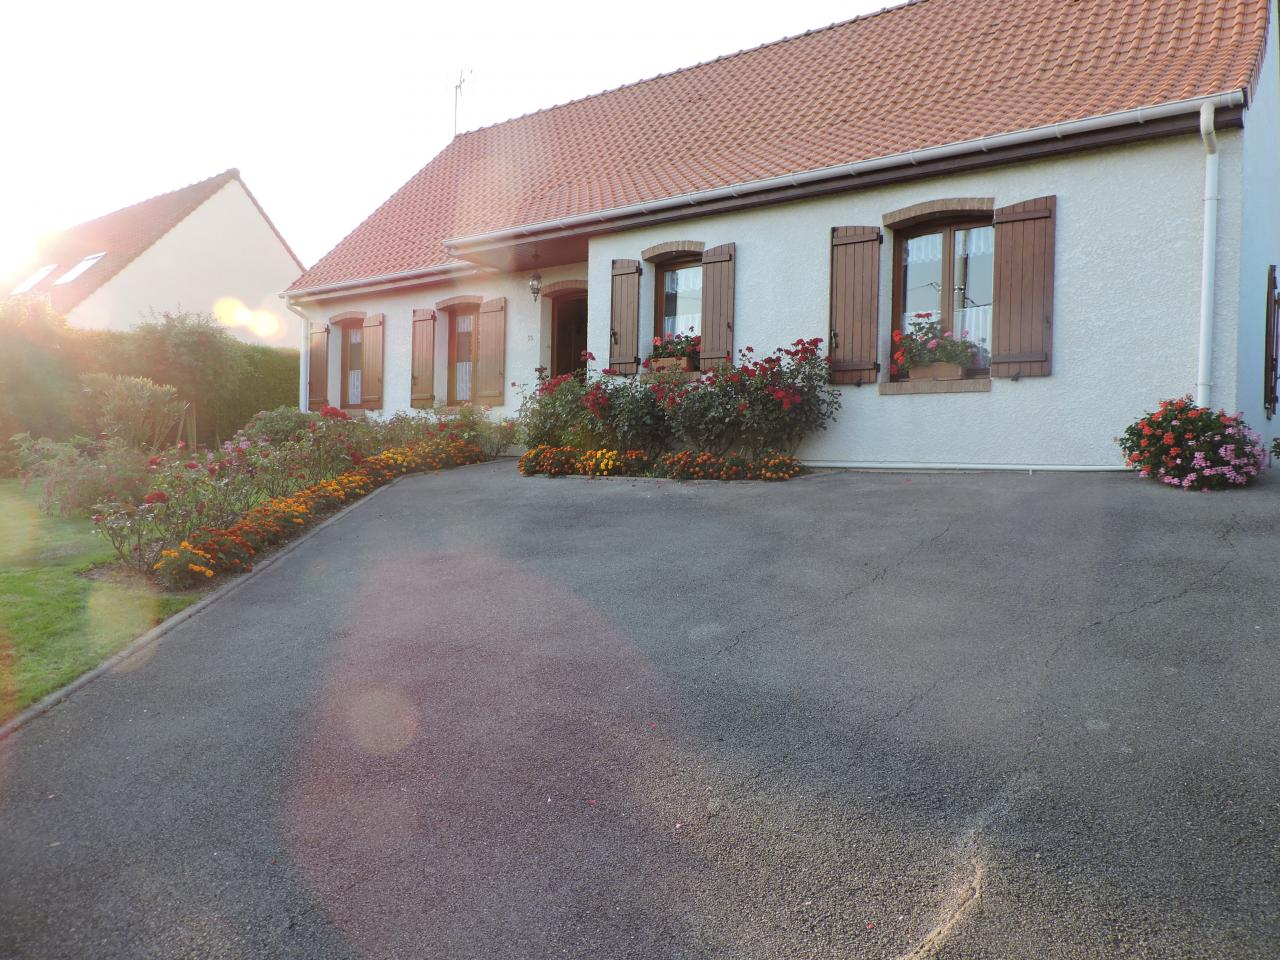 Maisons fleuries 2014 (27)